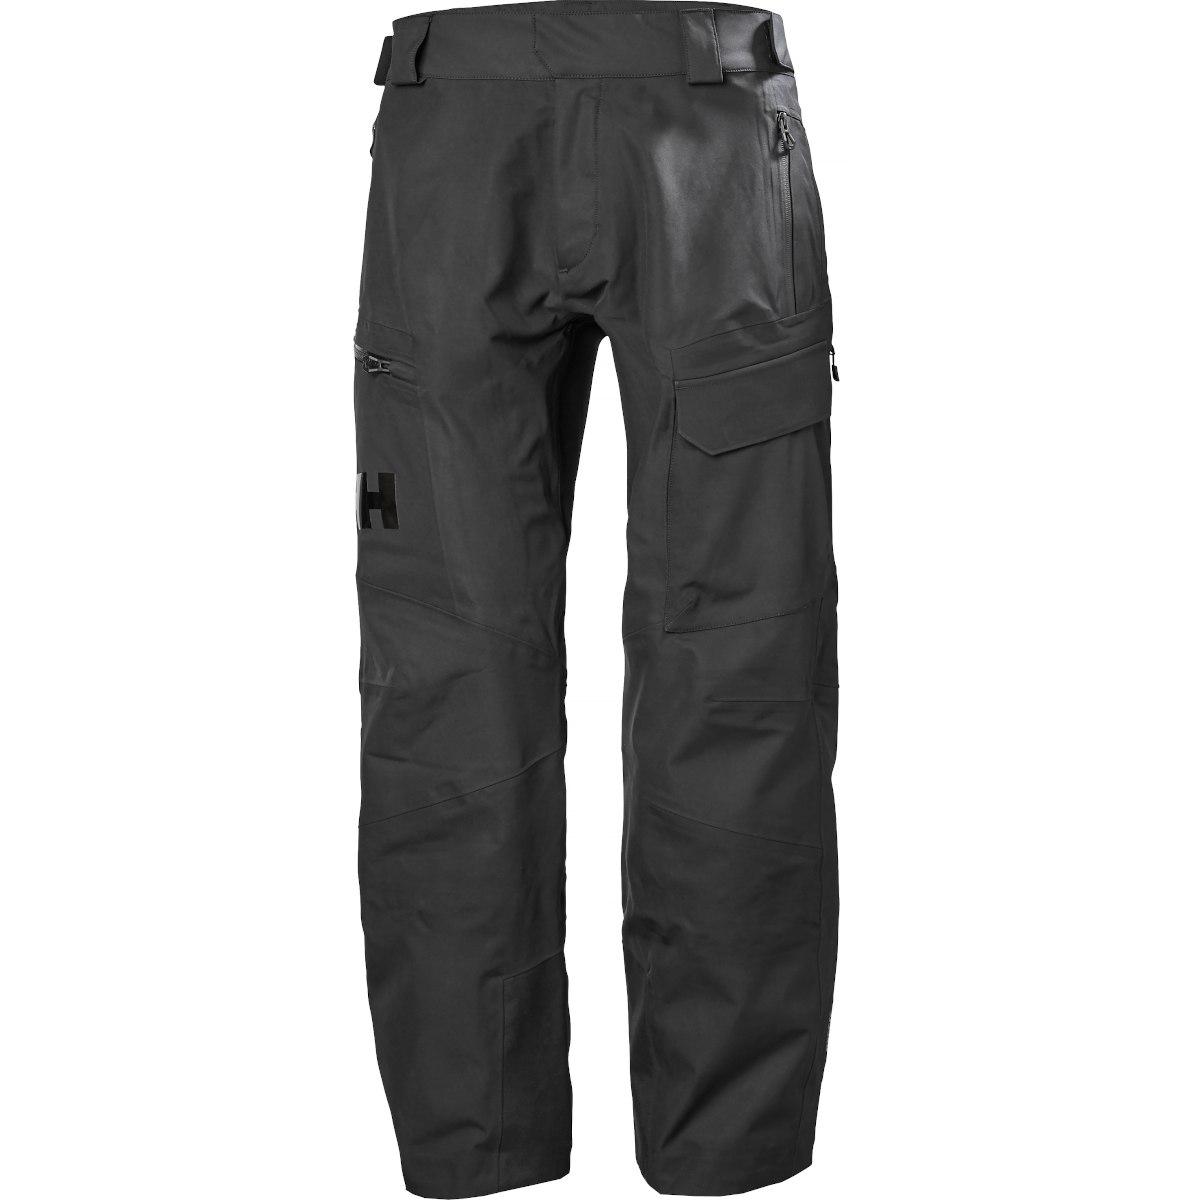 Image of Helly Hansen Ridge Shell Pant - black